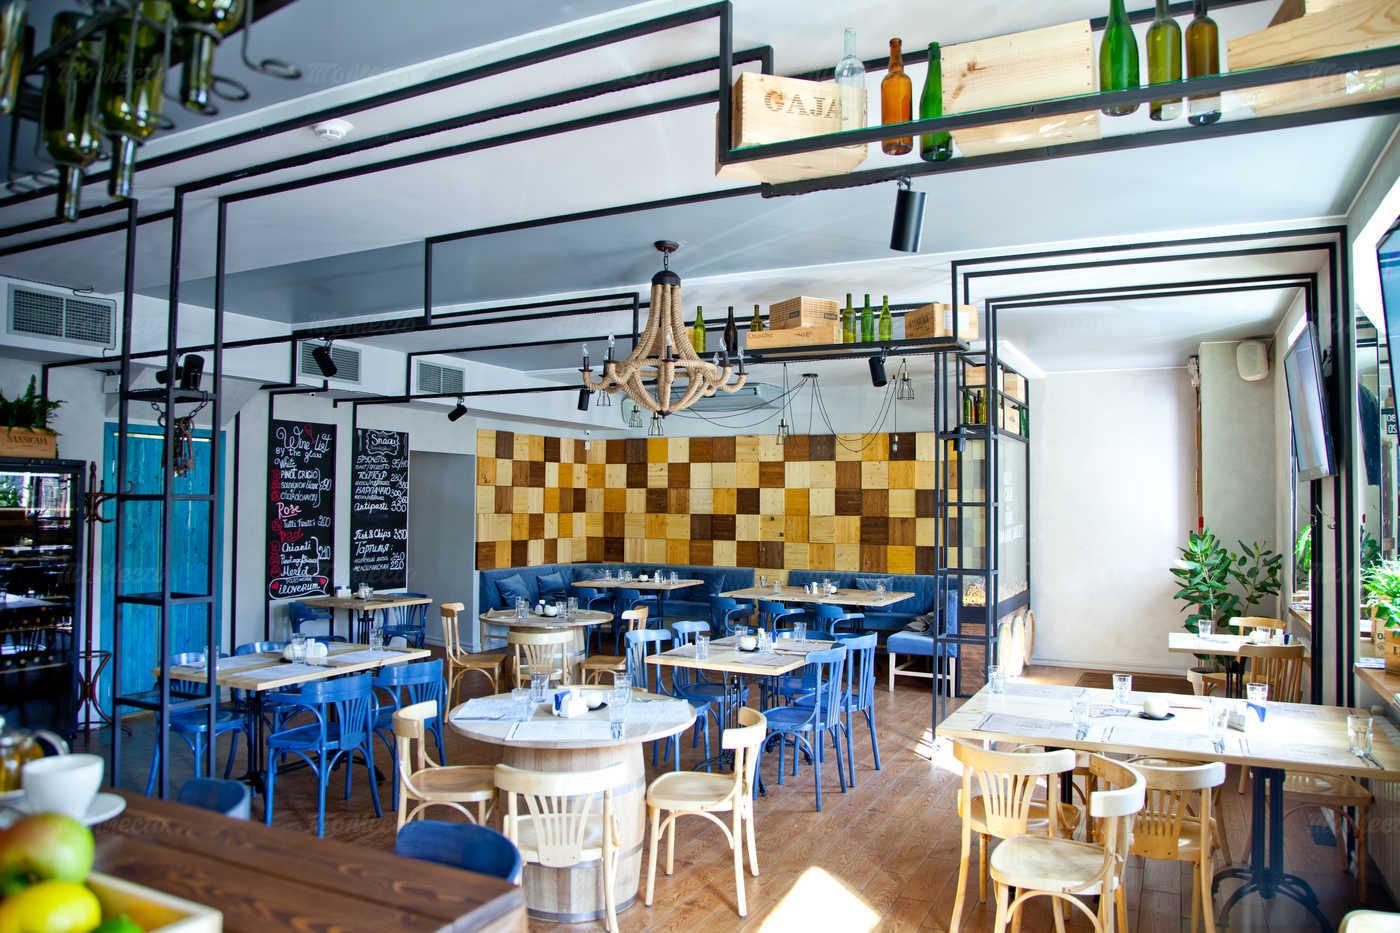 Меню бара, ресторана Файв Пойнтс (Five Points) на улице Ломоносова